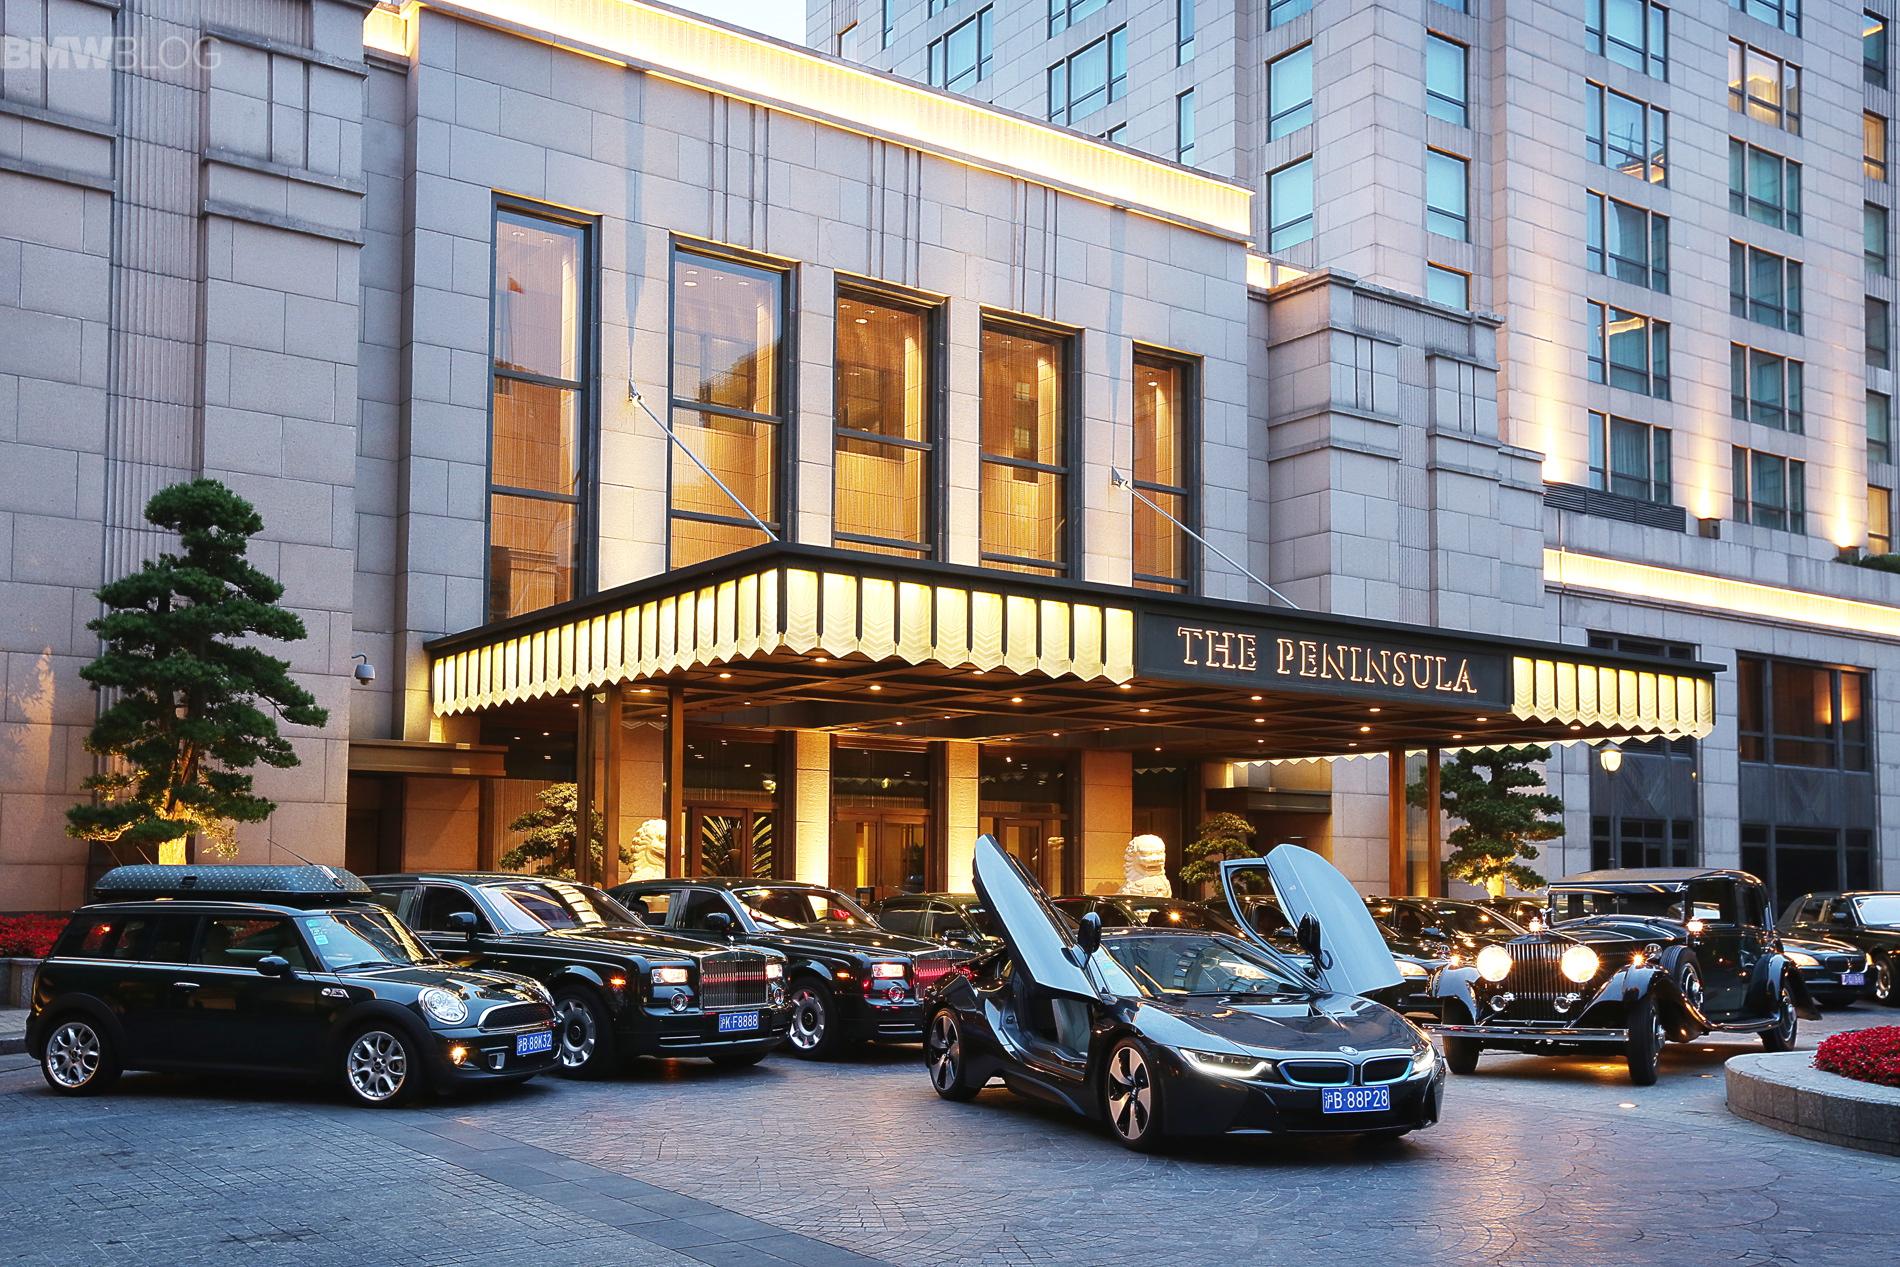 BMW i8 joins fleet of The Peninsula Shanghai images 01